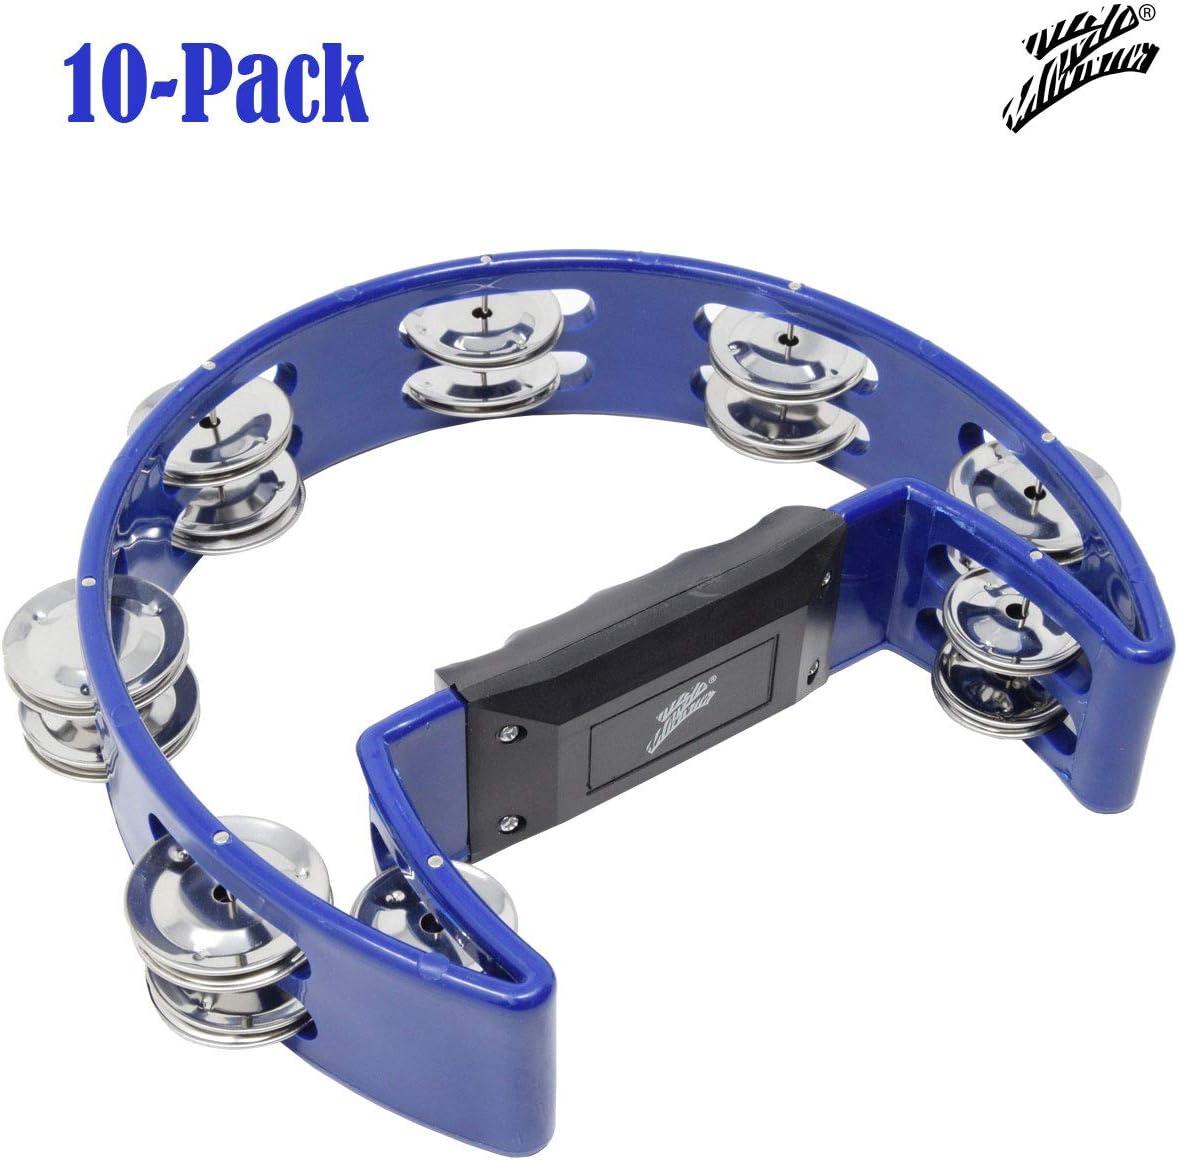 10-Pack Half Moon Tambourine Percussion Drum 8 Double Row Metal Jingles Blue